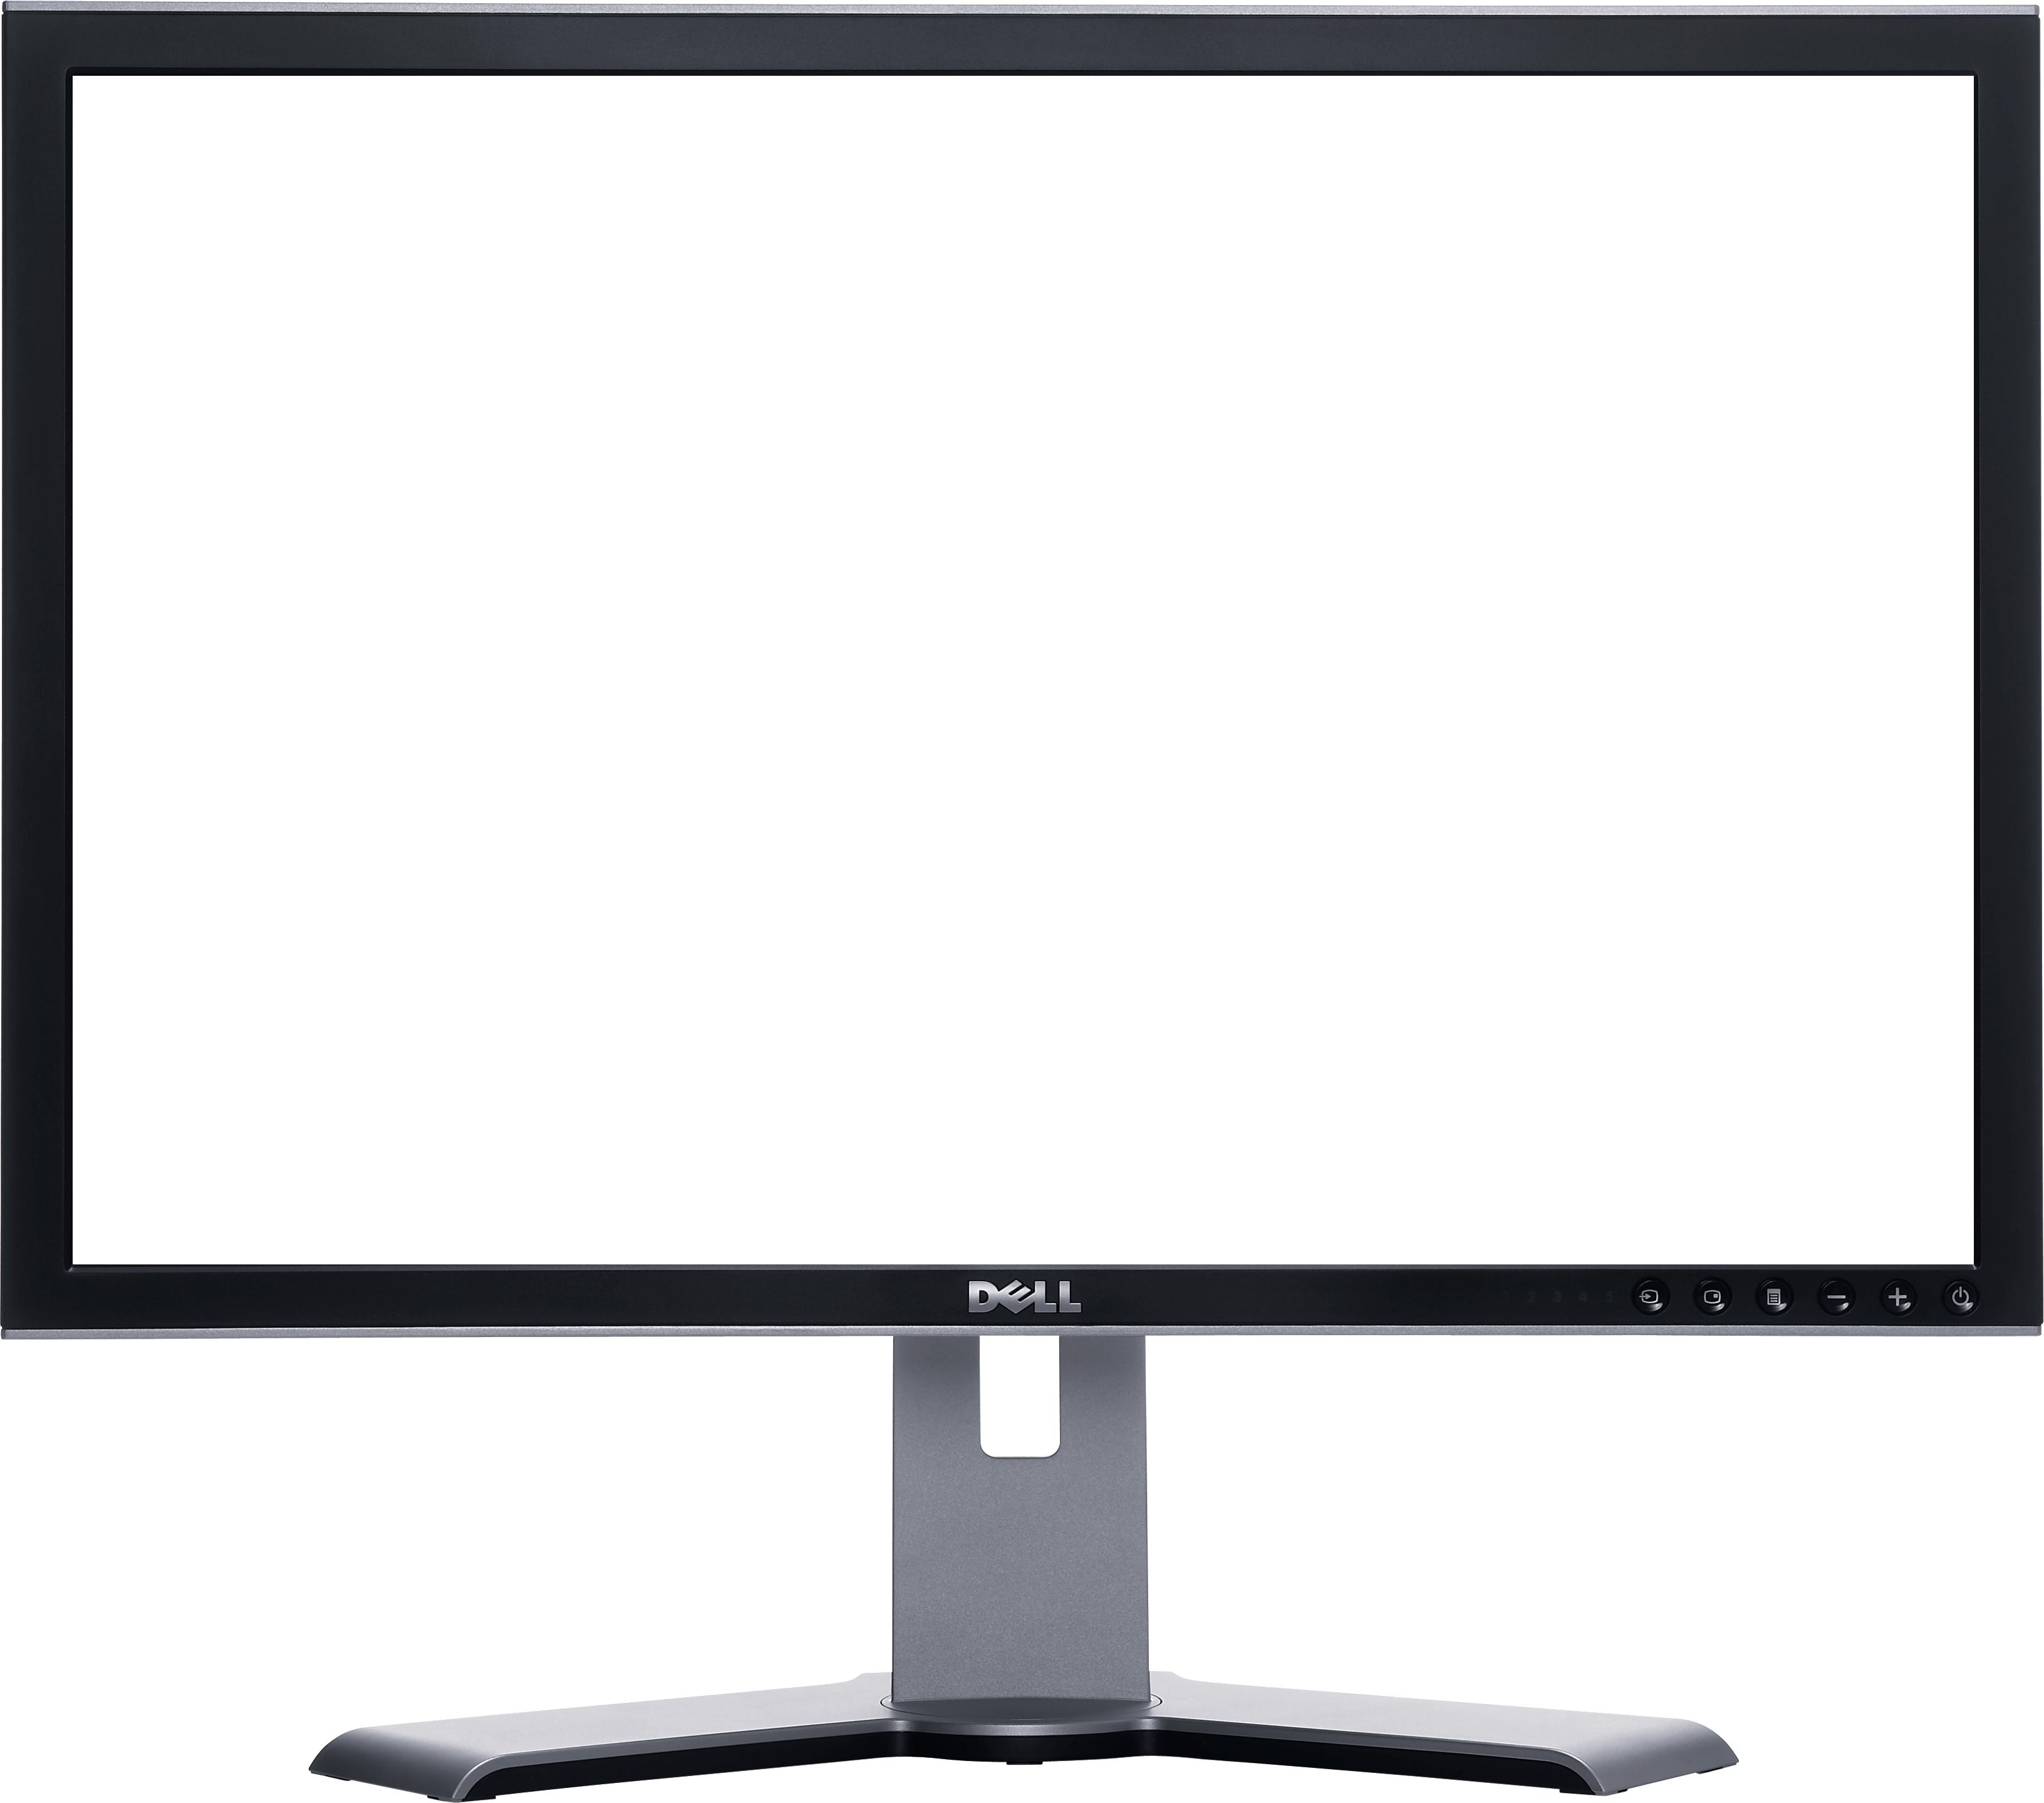 Monitor PNG - 1526